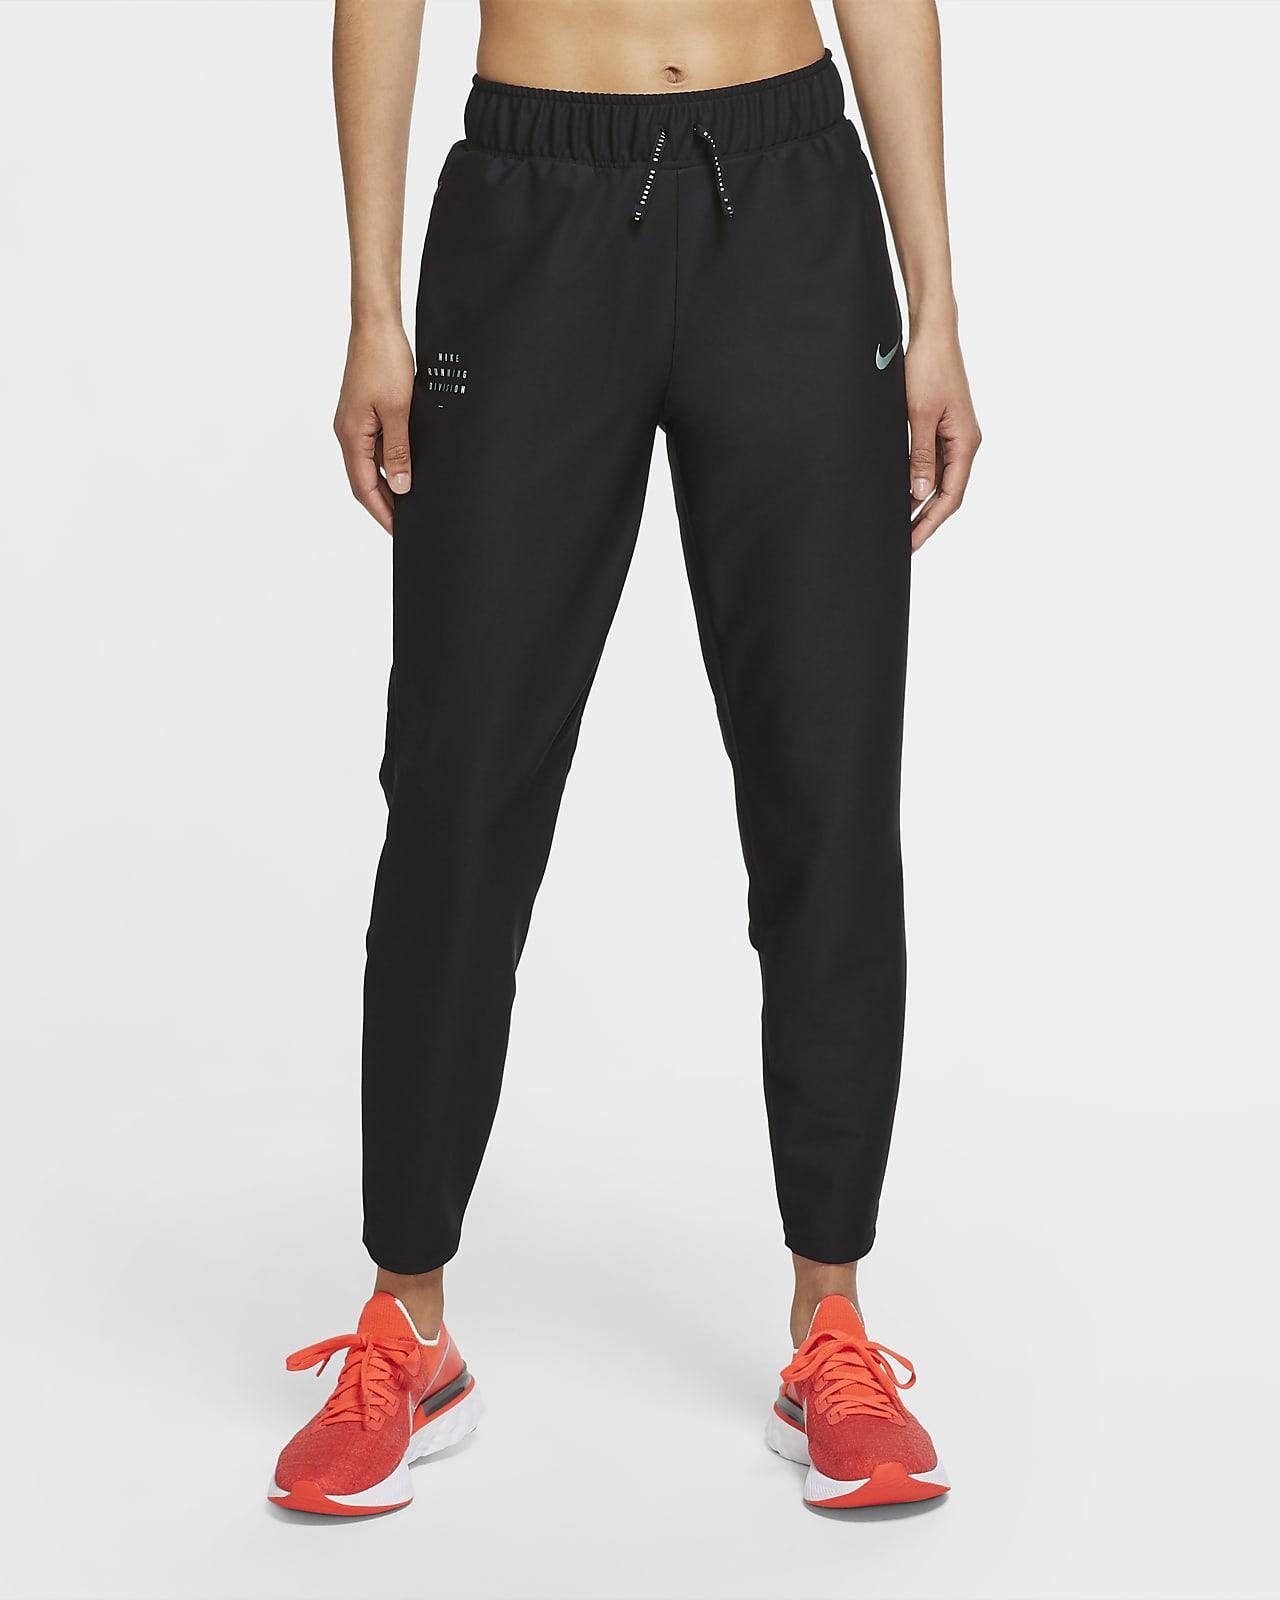 Nike Shield Run Division Women's Running Trousers